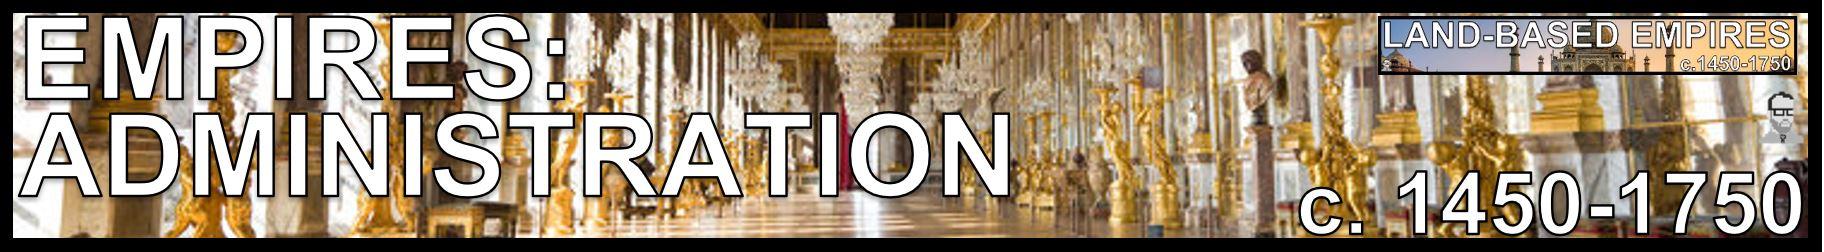 EMPIRES ADMINISTRATION BANNER AP WORLD MODERN FREEMANPEDIA.JPG